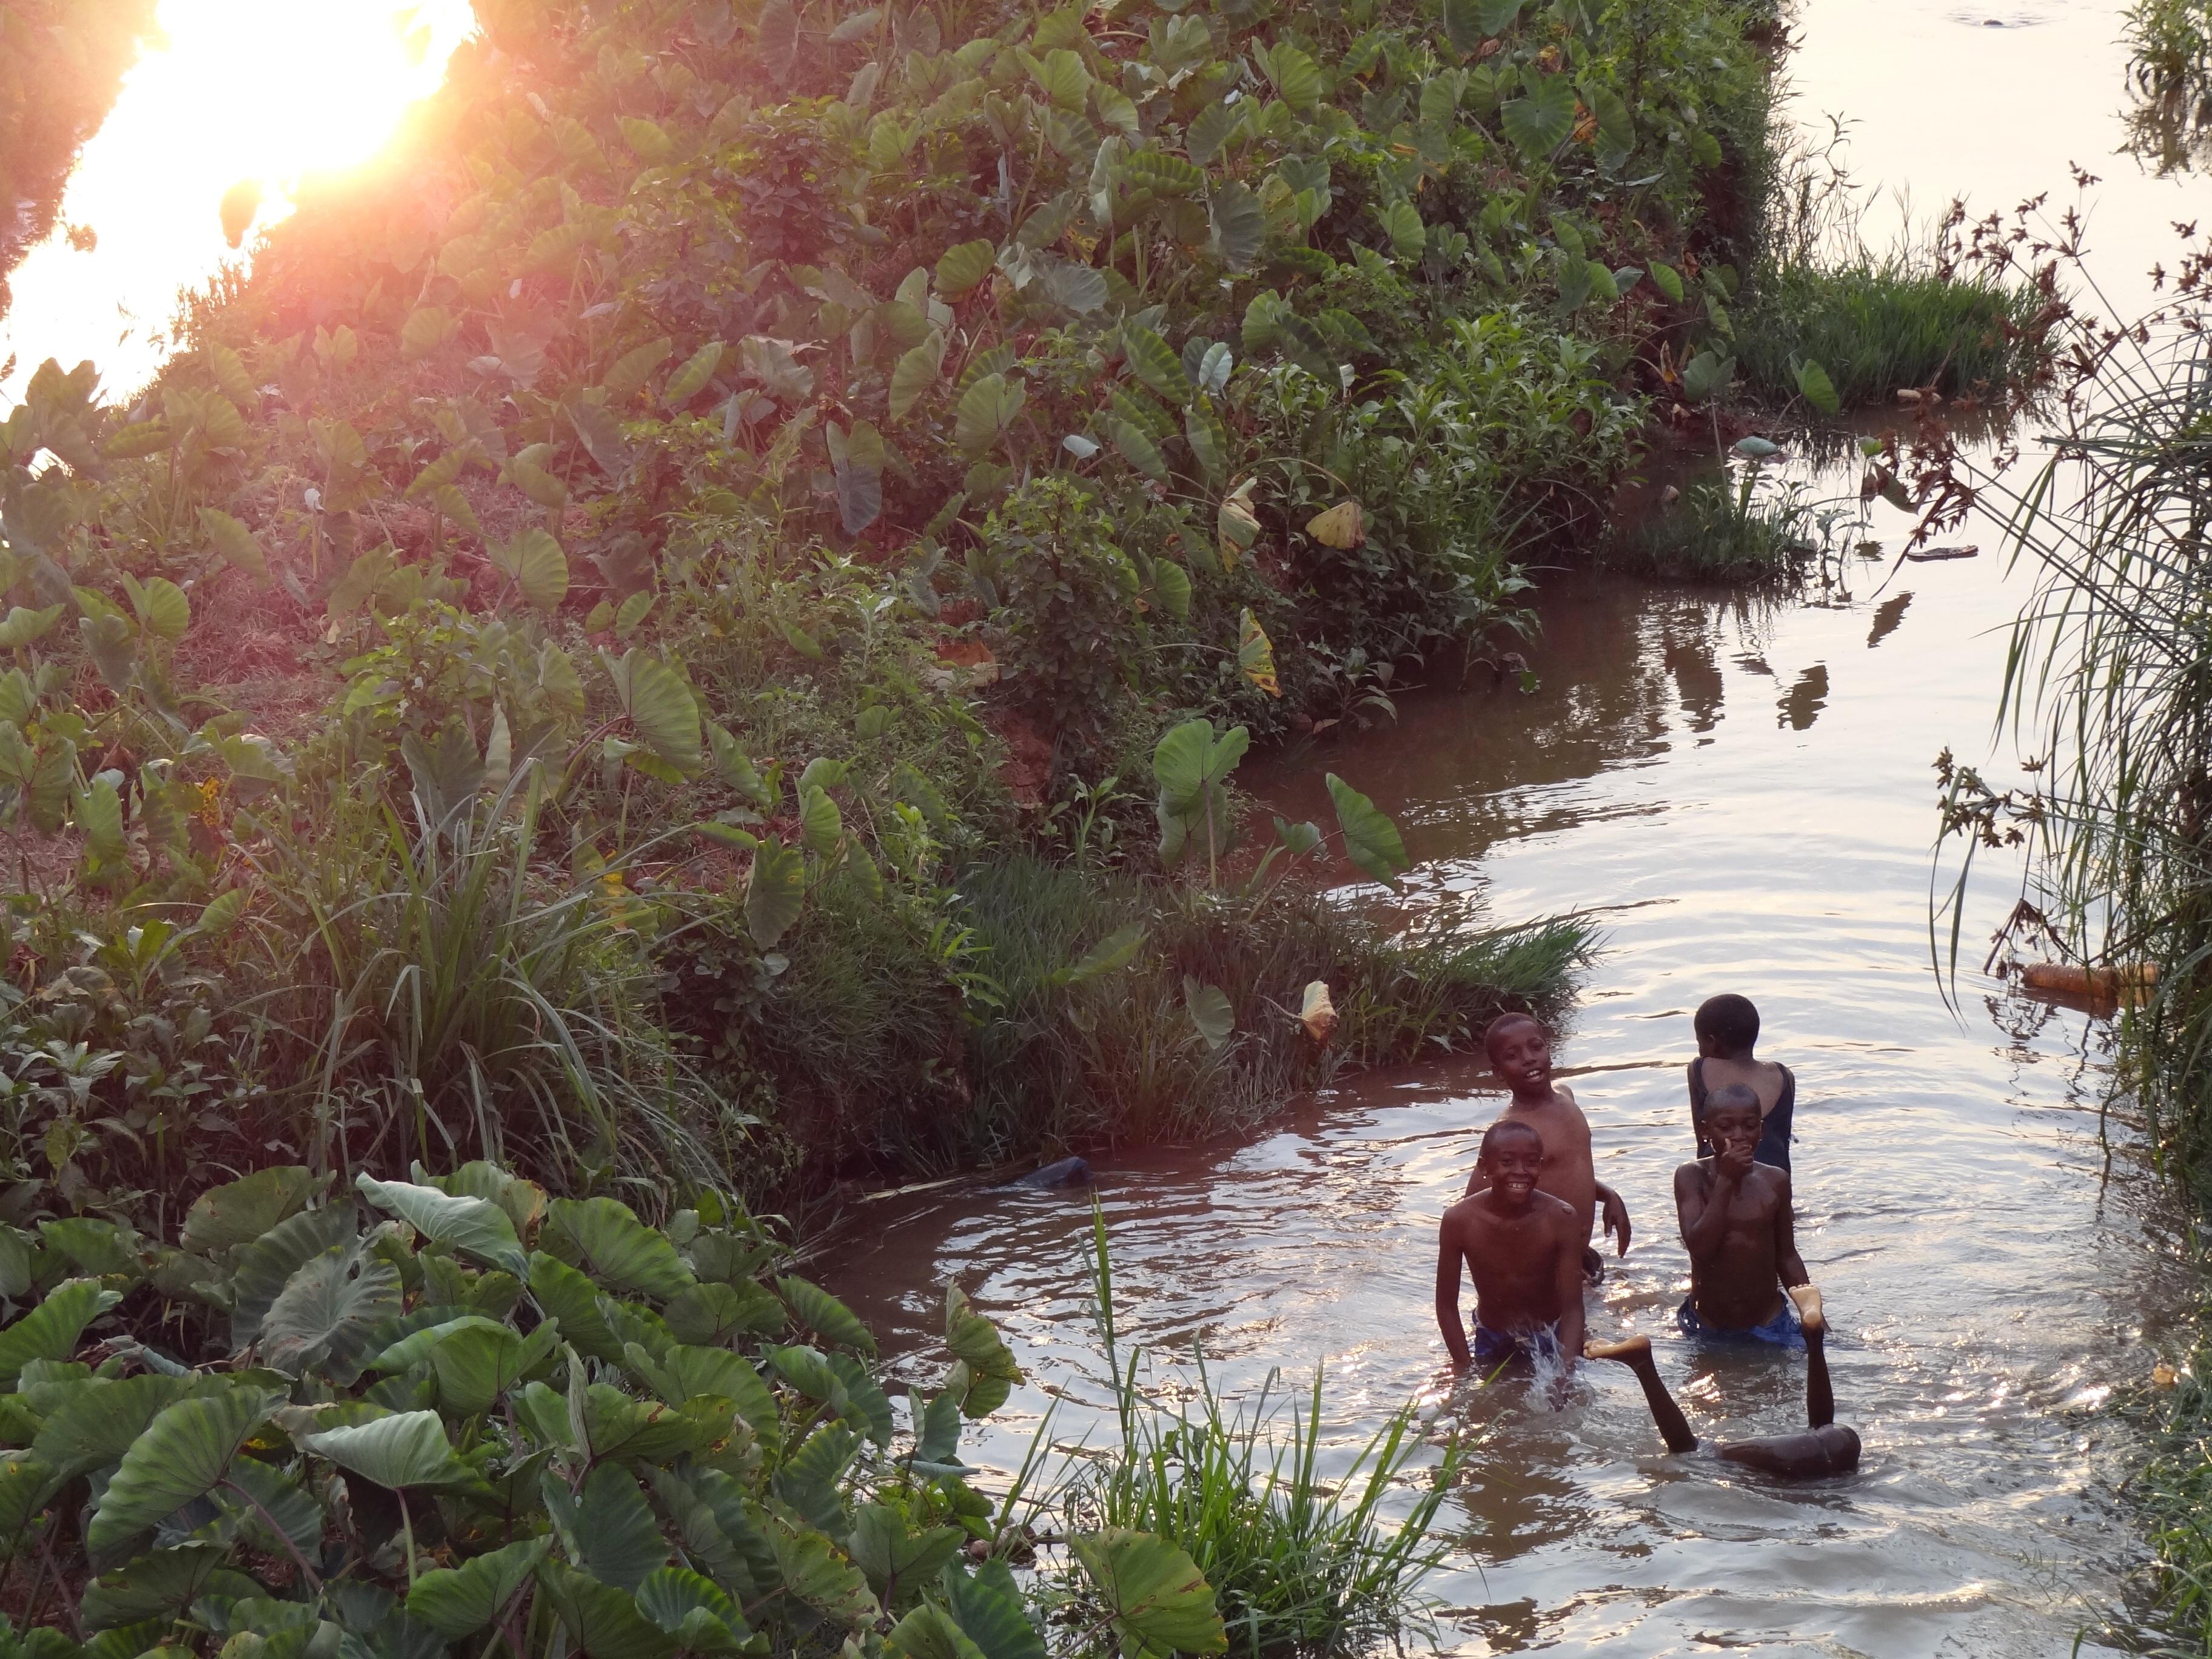 Description children play in river - kigali - rwanda - 02